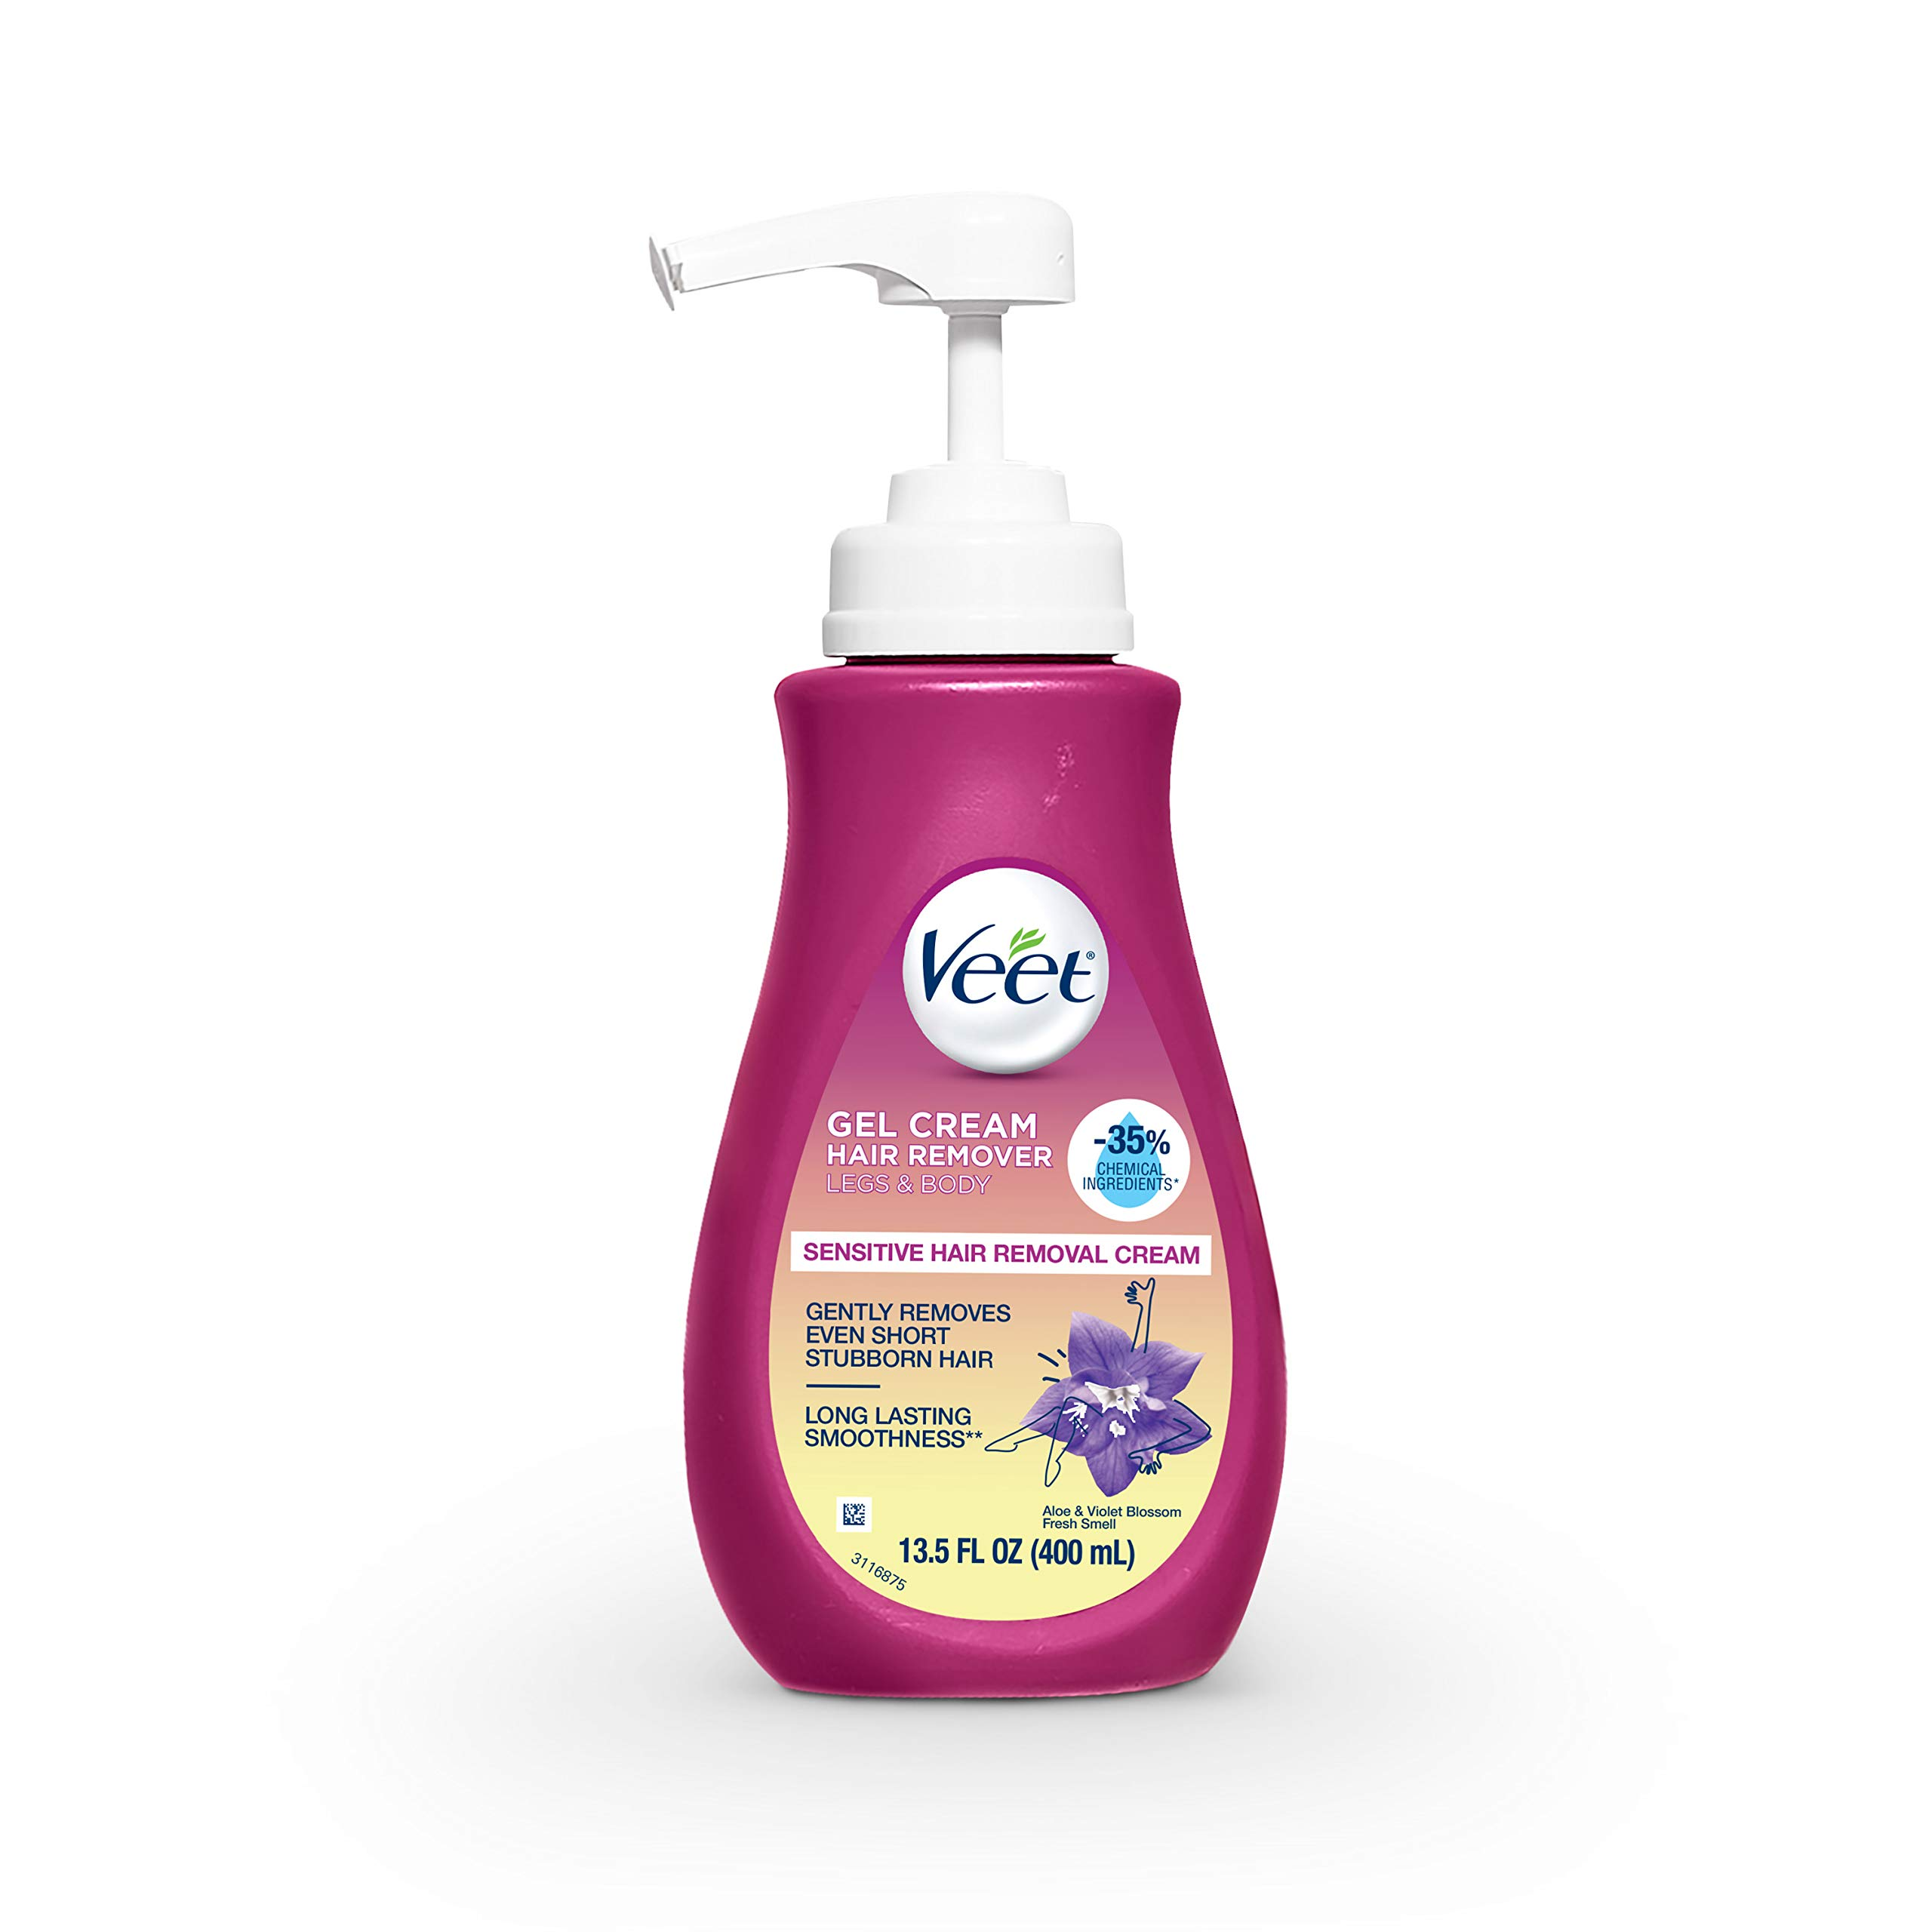 Veet Sensitive Hair Remover Gel Cream Pink, 13.5 Fl Oz